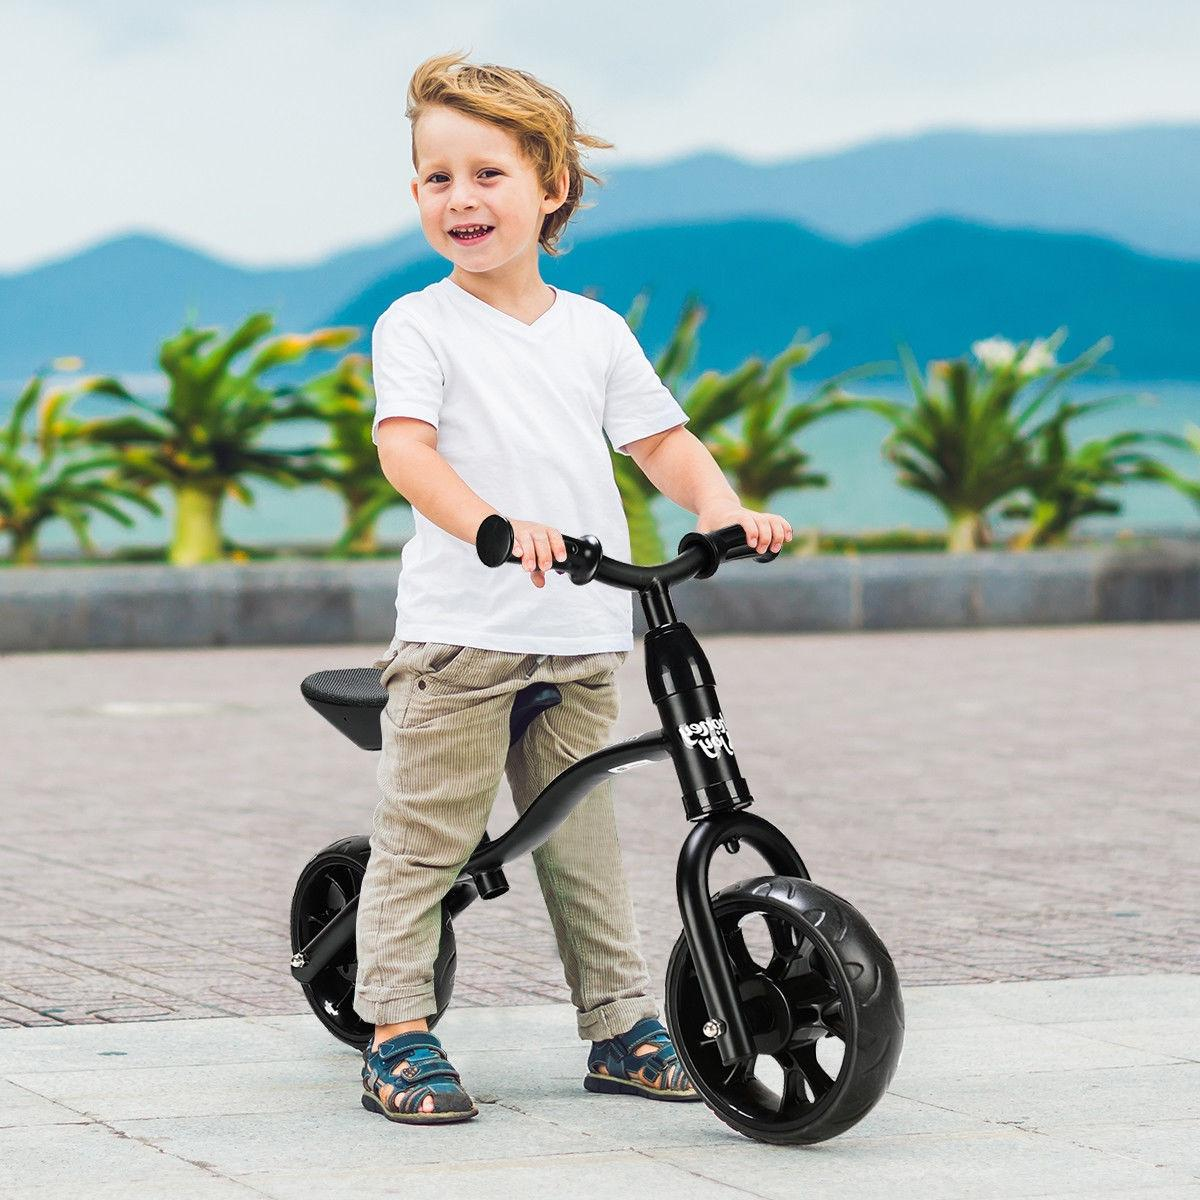 Kids Balance Sport No-Pedal Training Bicycle w/ Seat Black